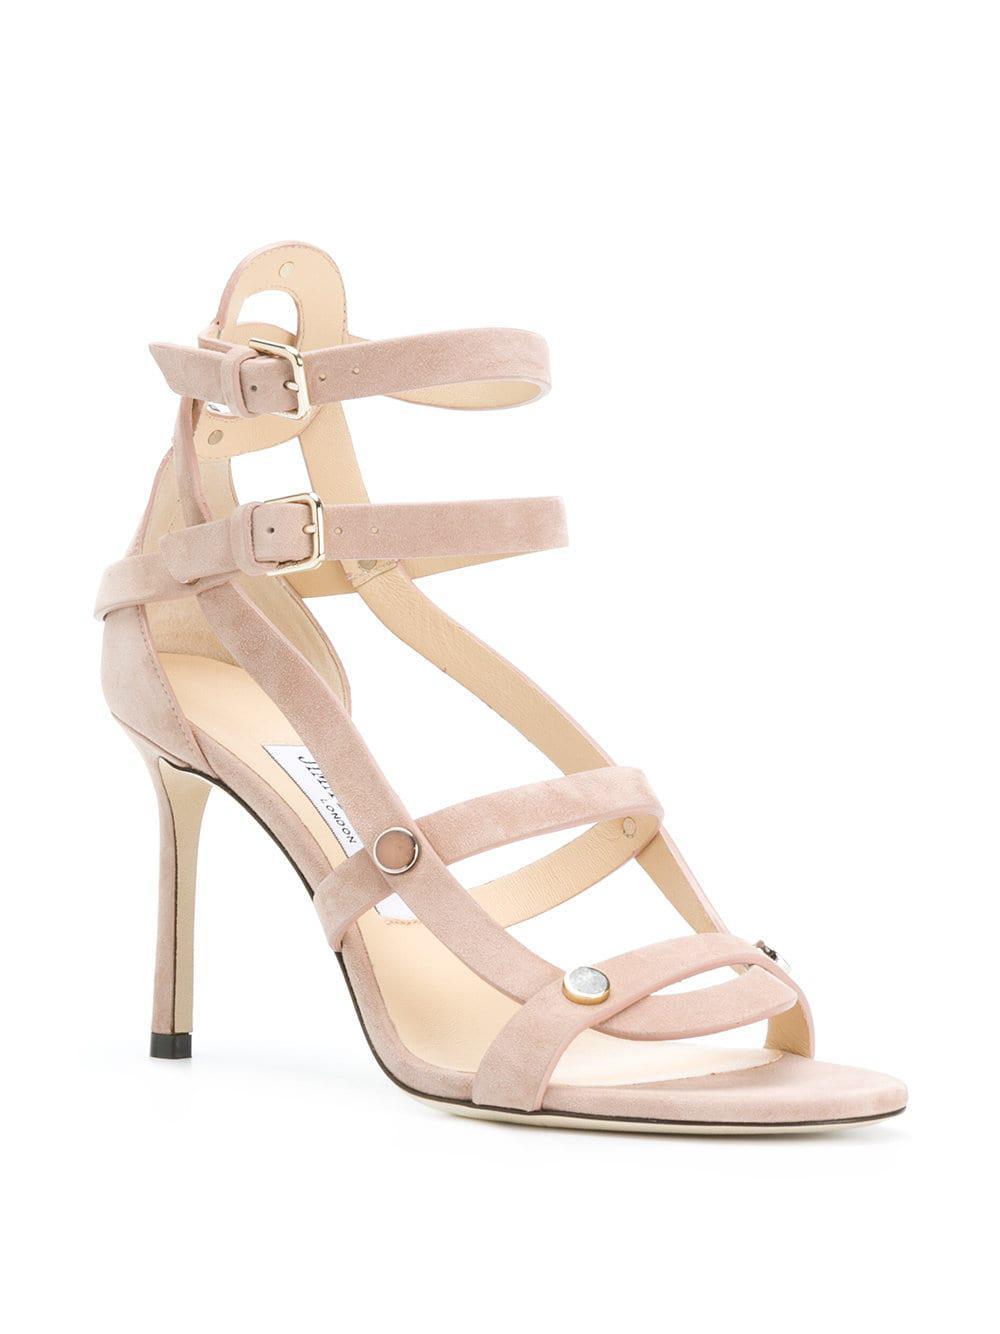 7983c63487e Jimmy Choo - Pink Motoko 85 Sandals - Lyst. View fullscreen